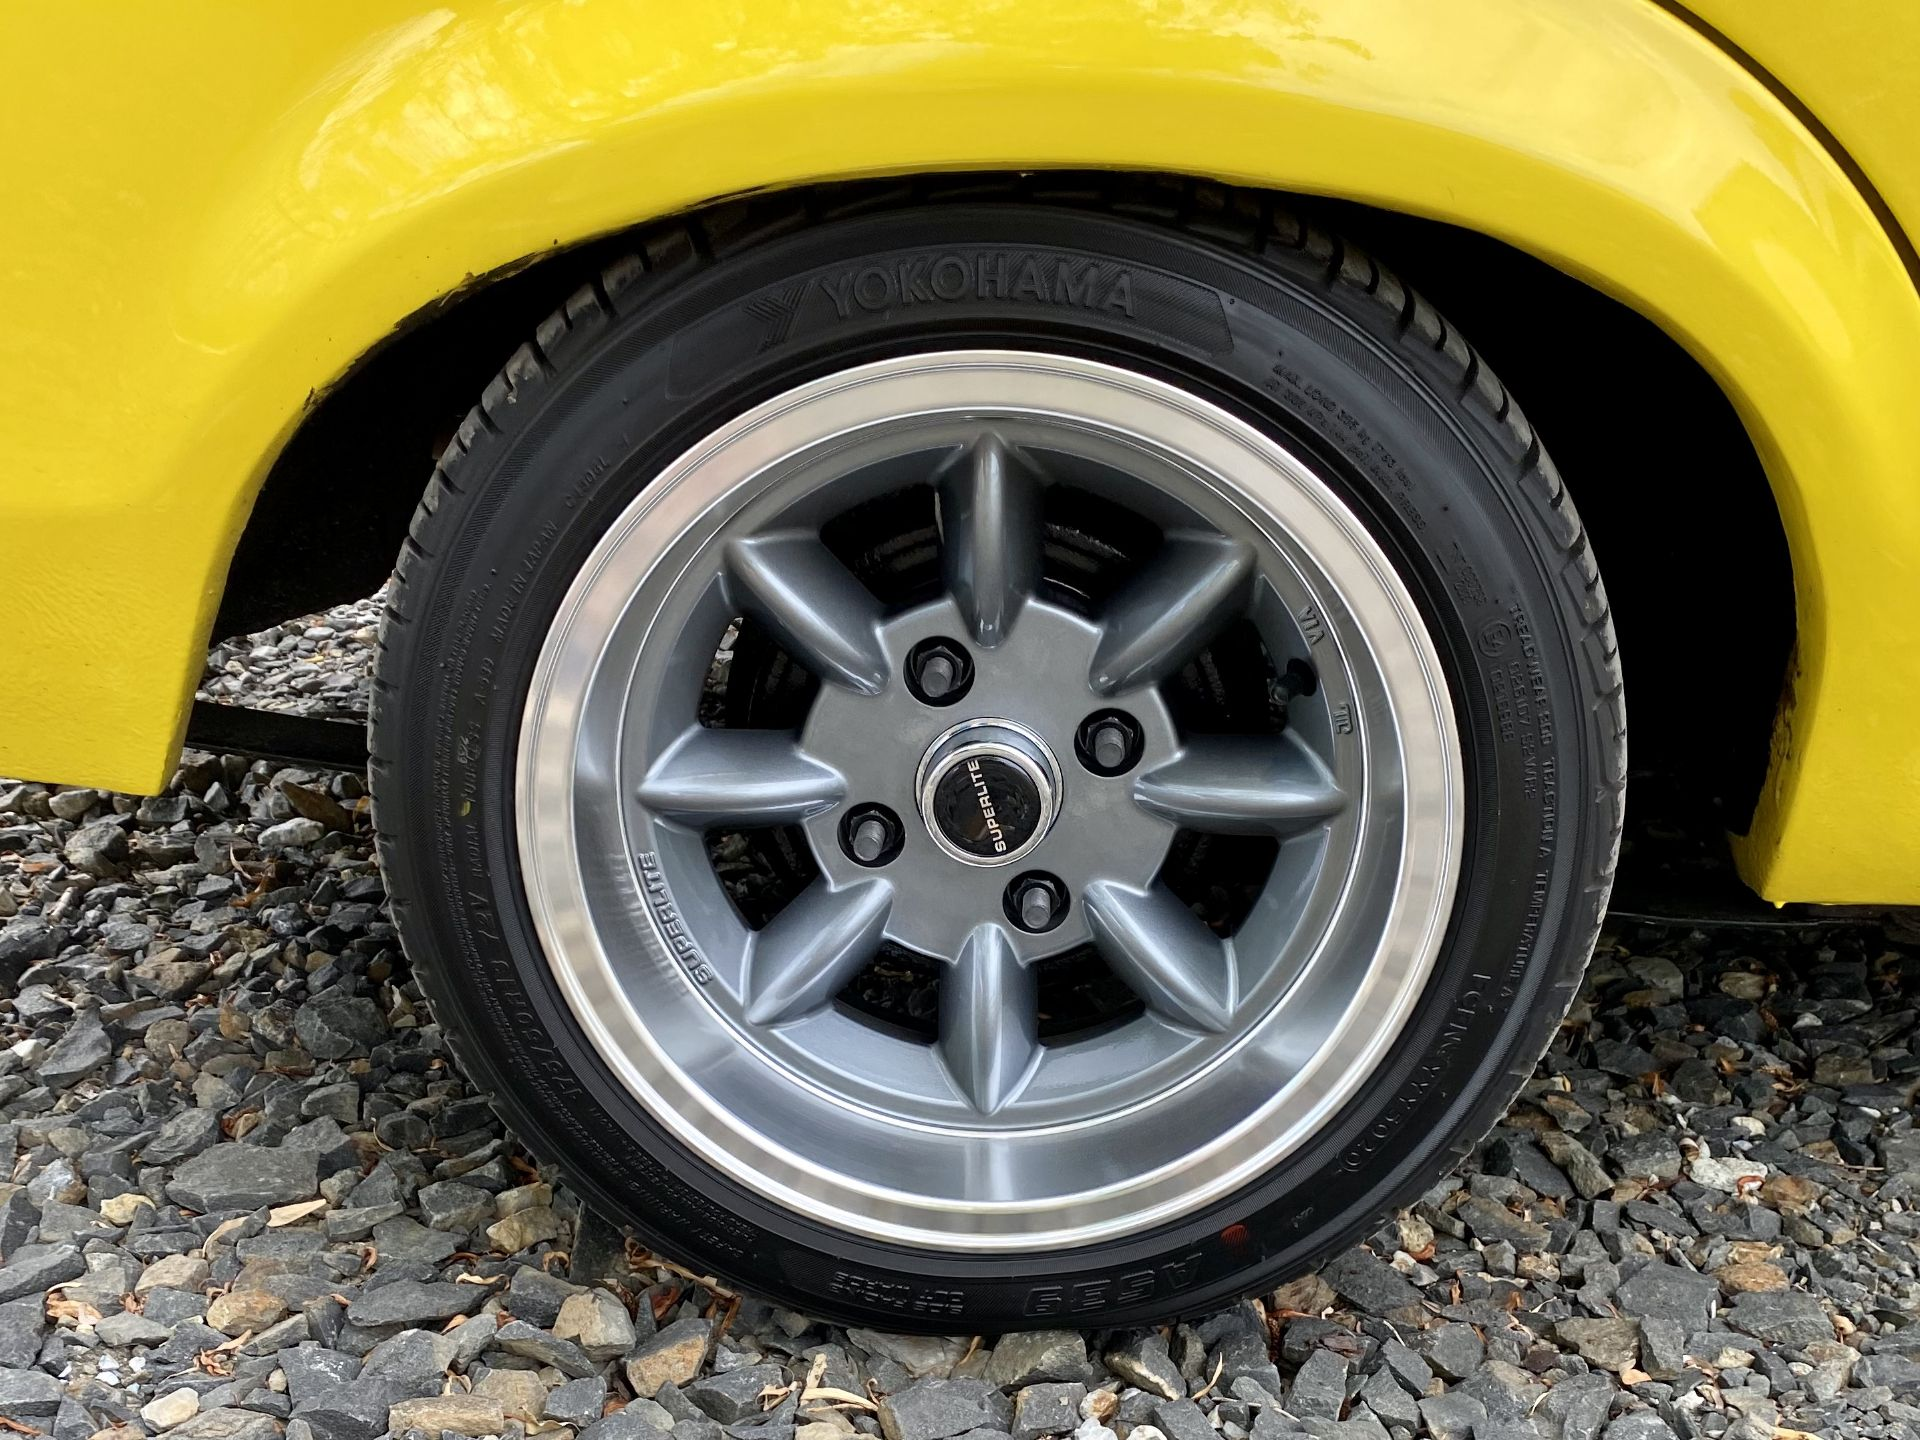 Ford Escort MK2 - Image 27 of 58